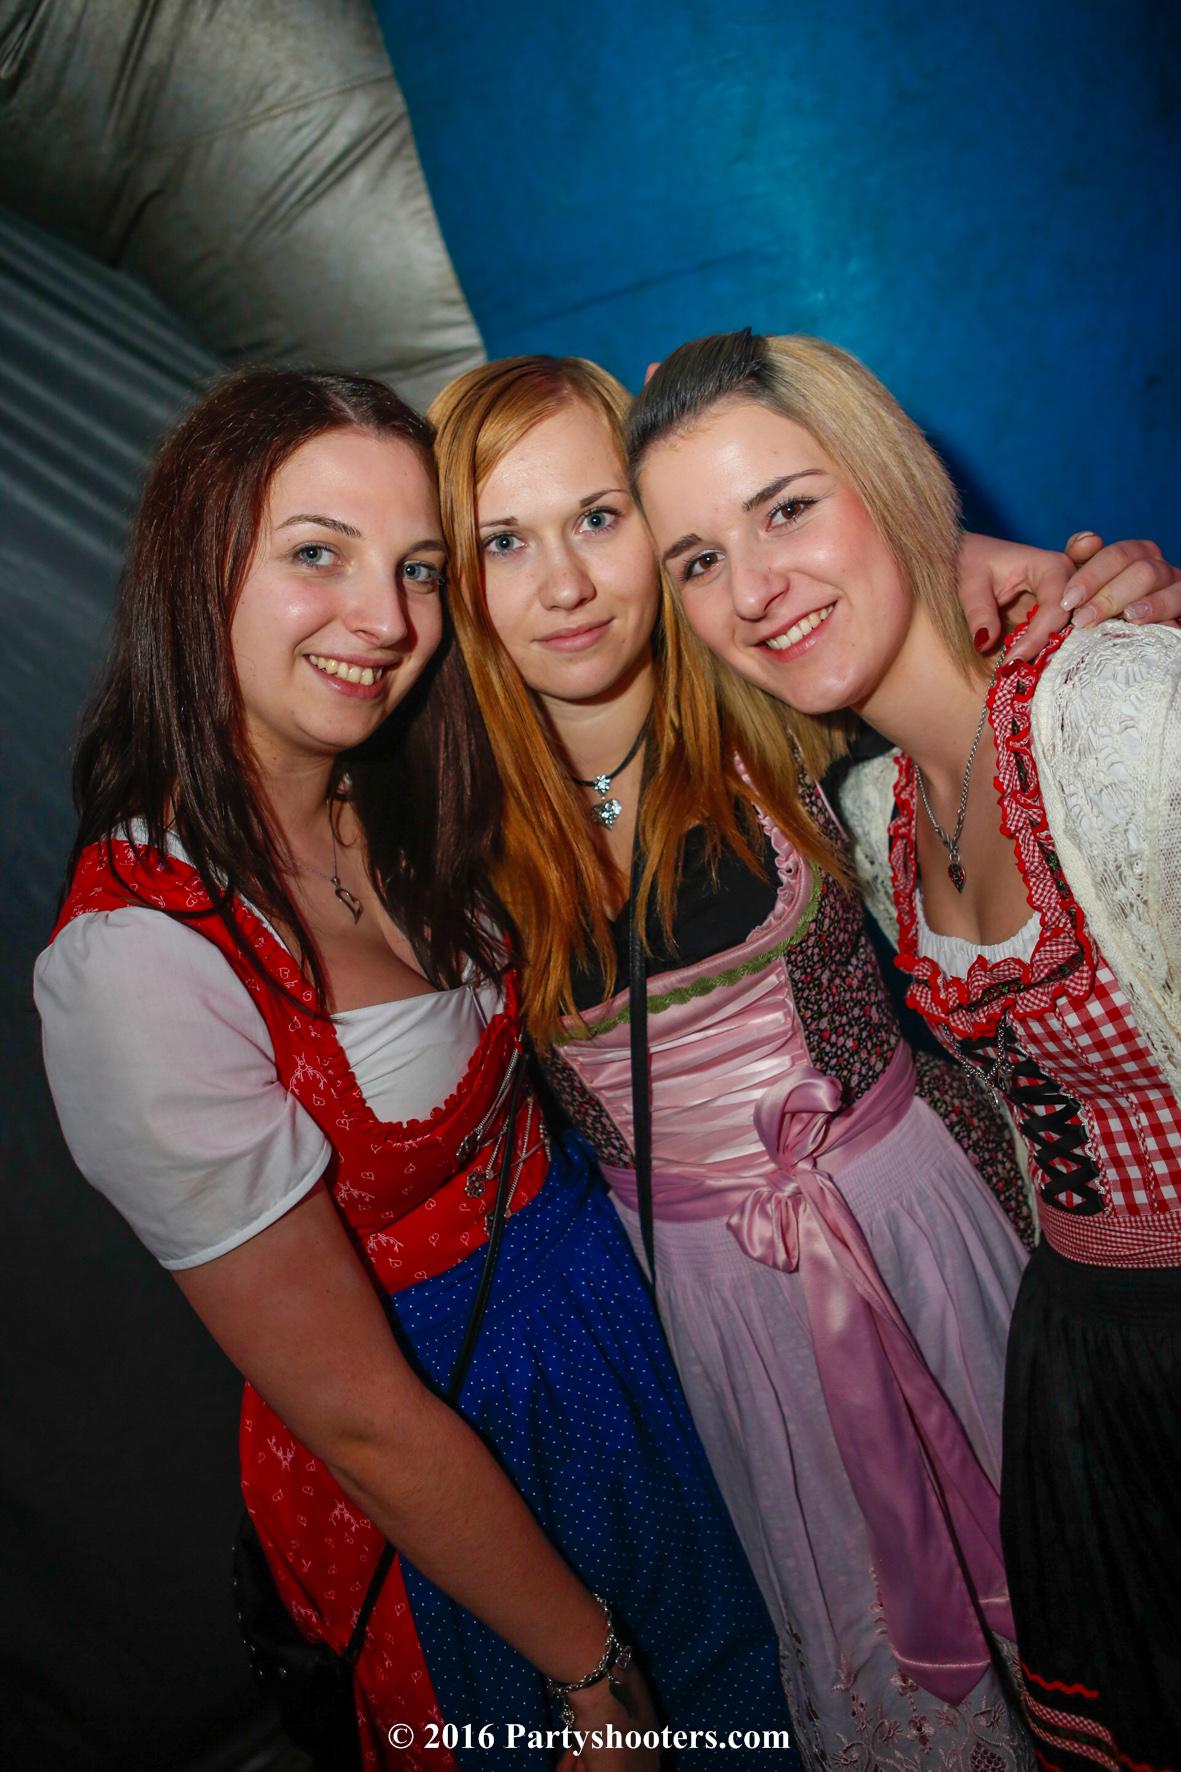 0103 - 4069 - Fruehlingsball Aspach